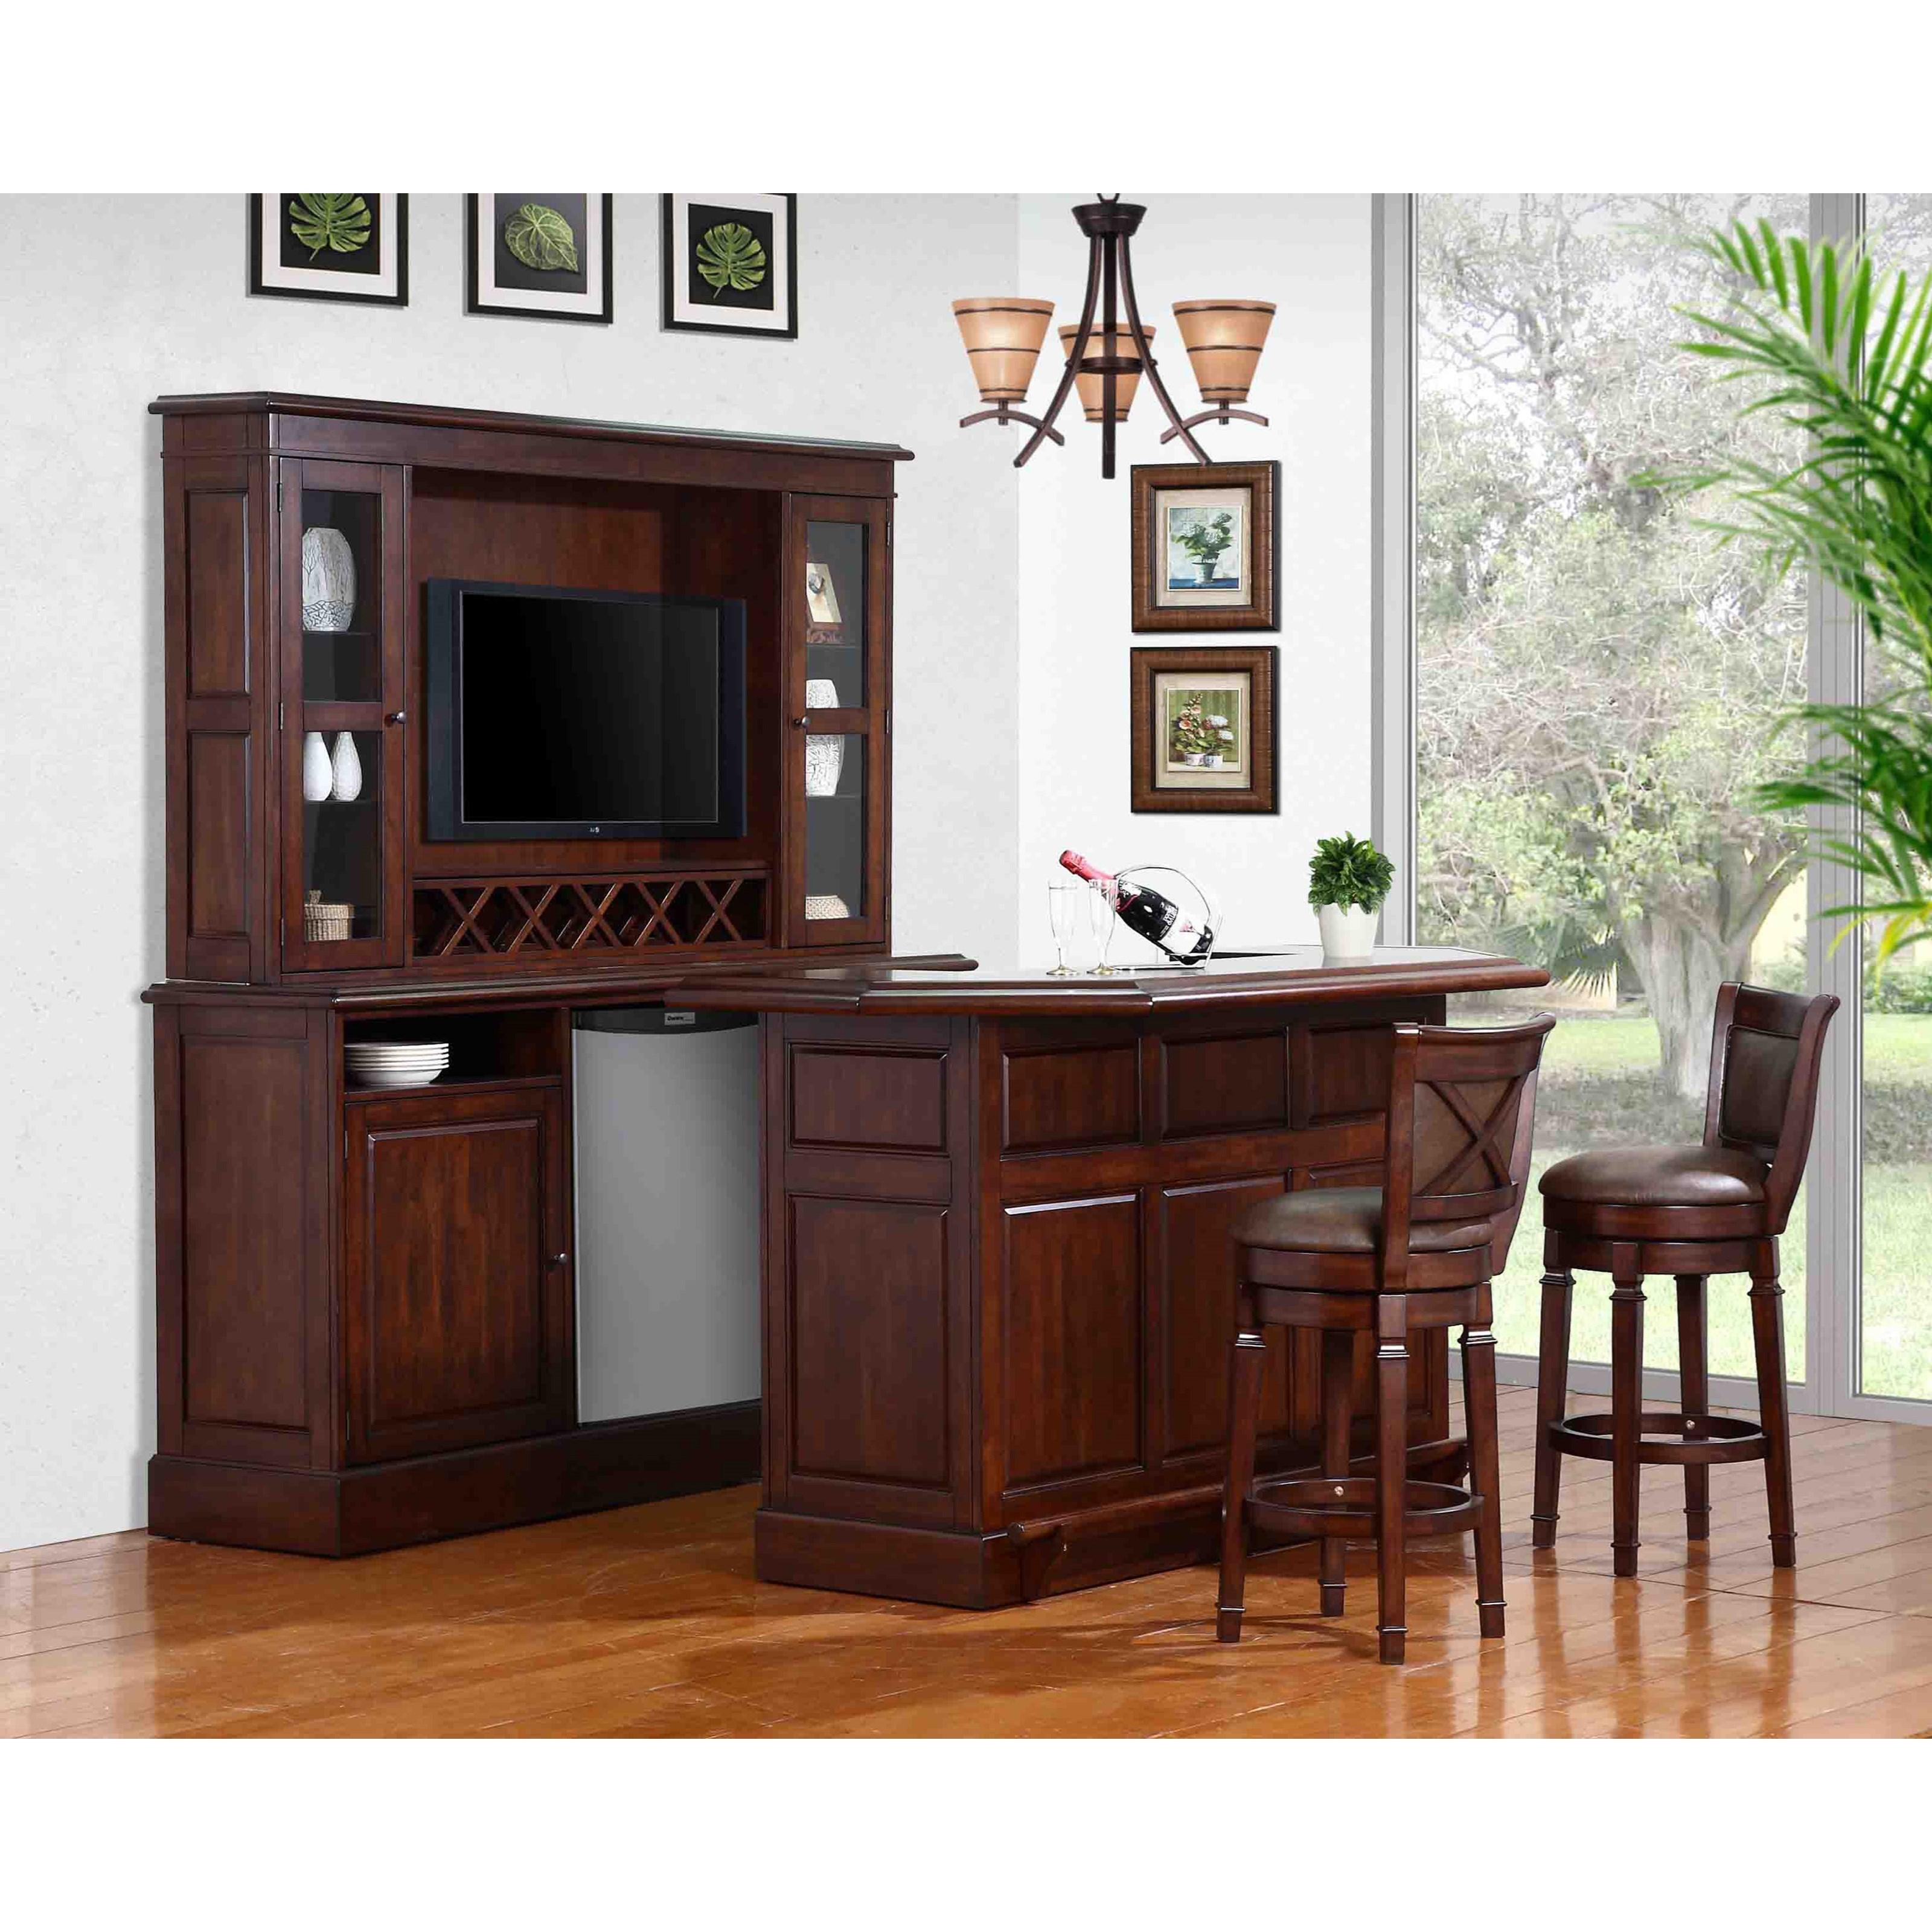 E.C.I. Furniture Belvedere 0411Complete Bar And Stool Set